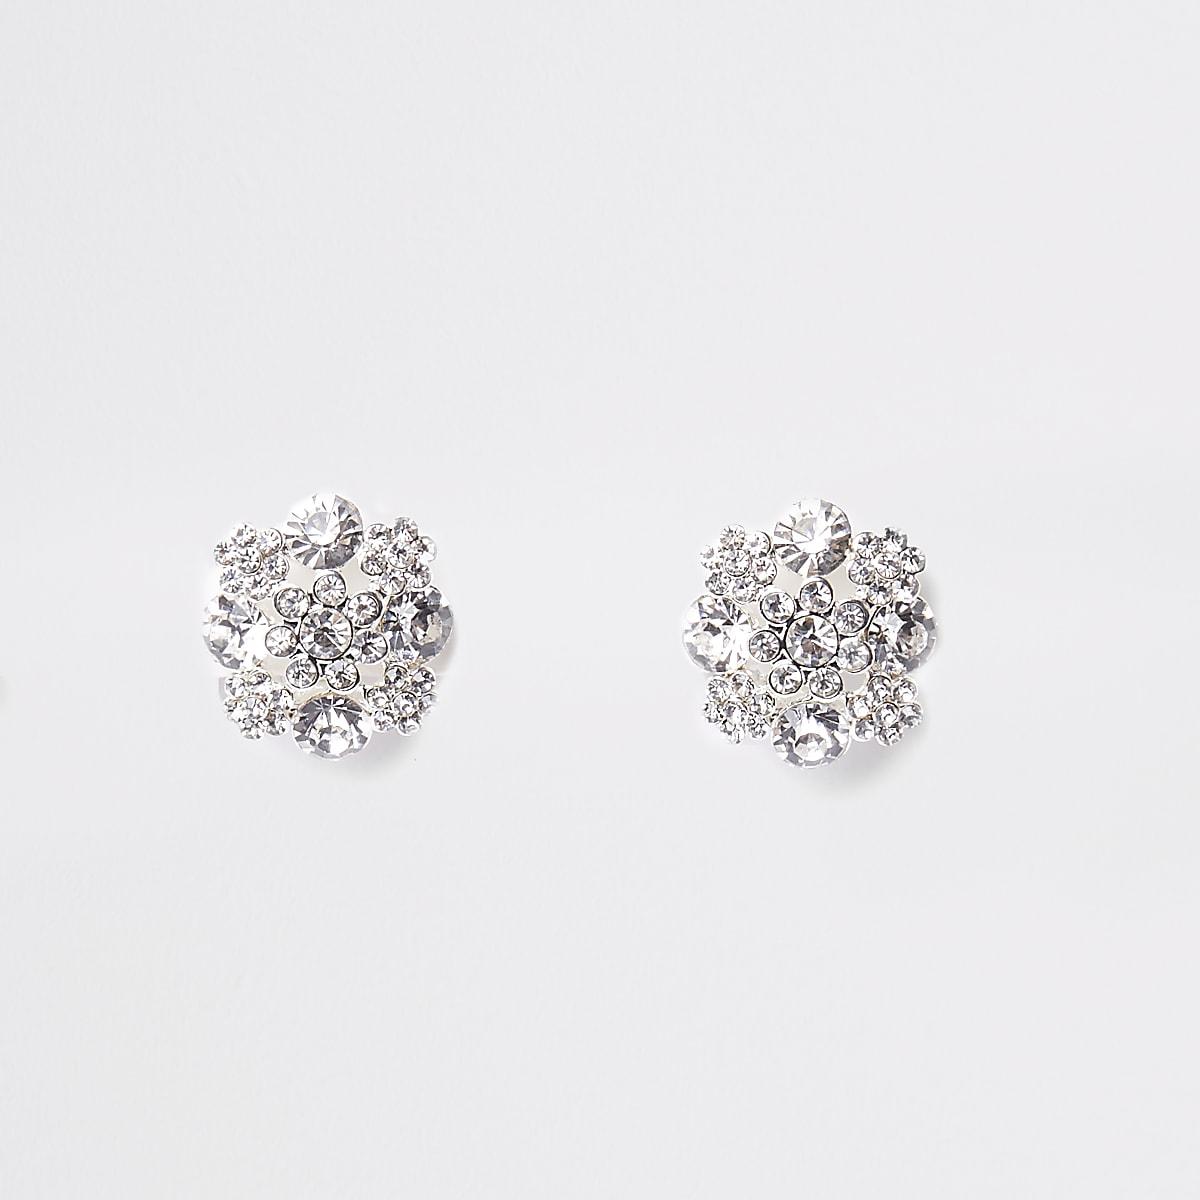 White diamante clip on earrings